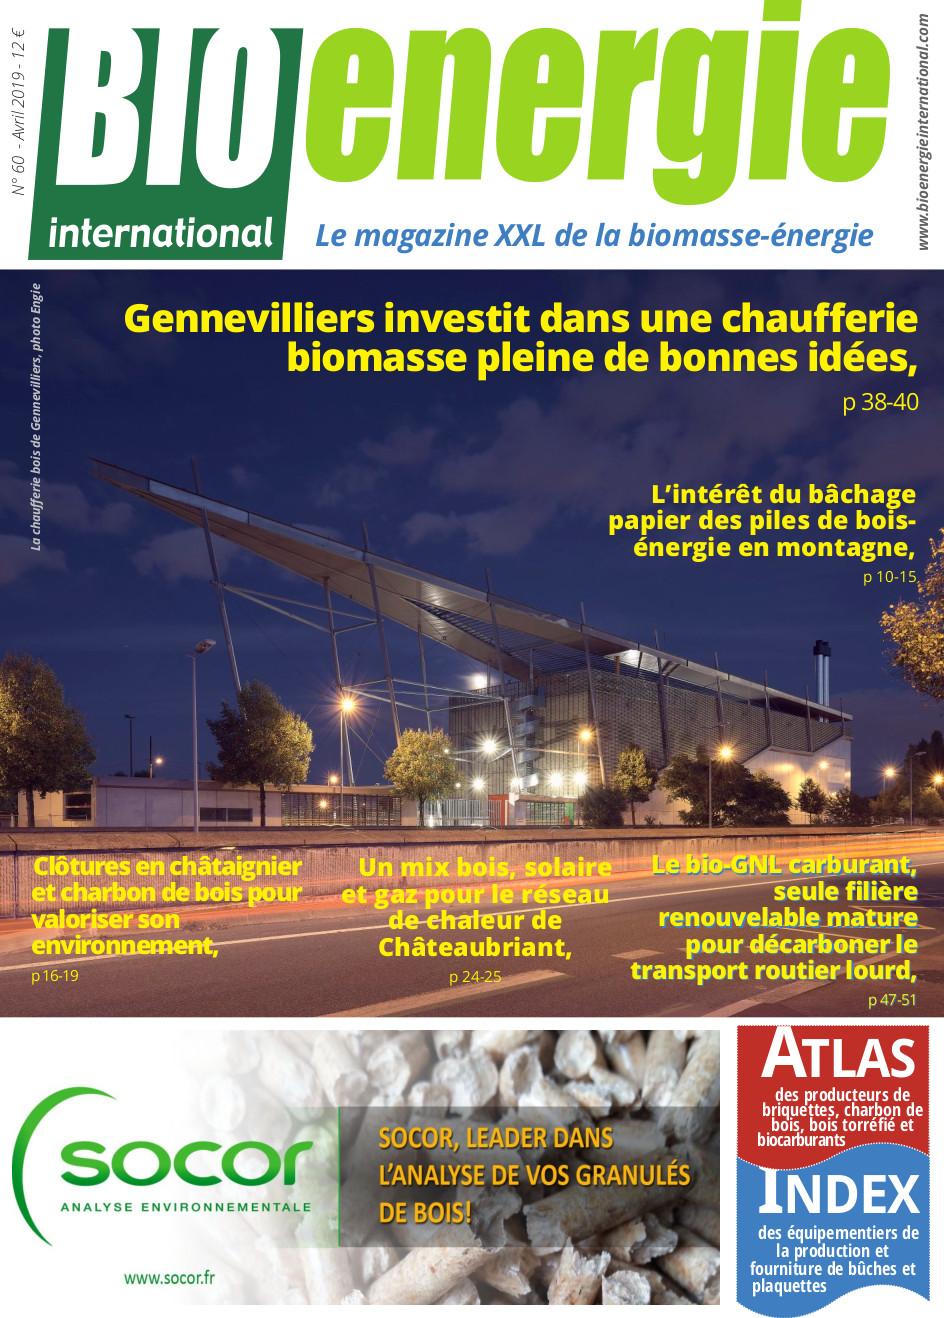 Bioénergie International n°60 – Avril 2019